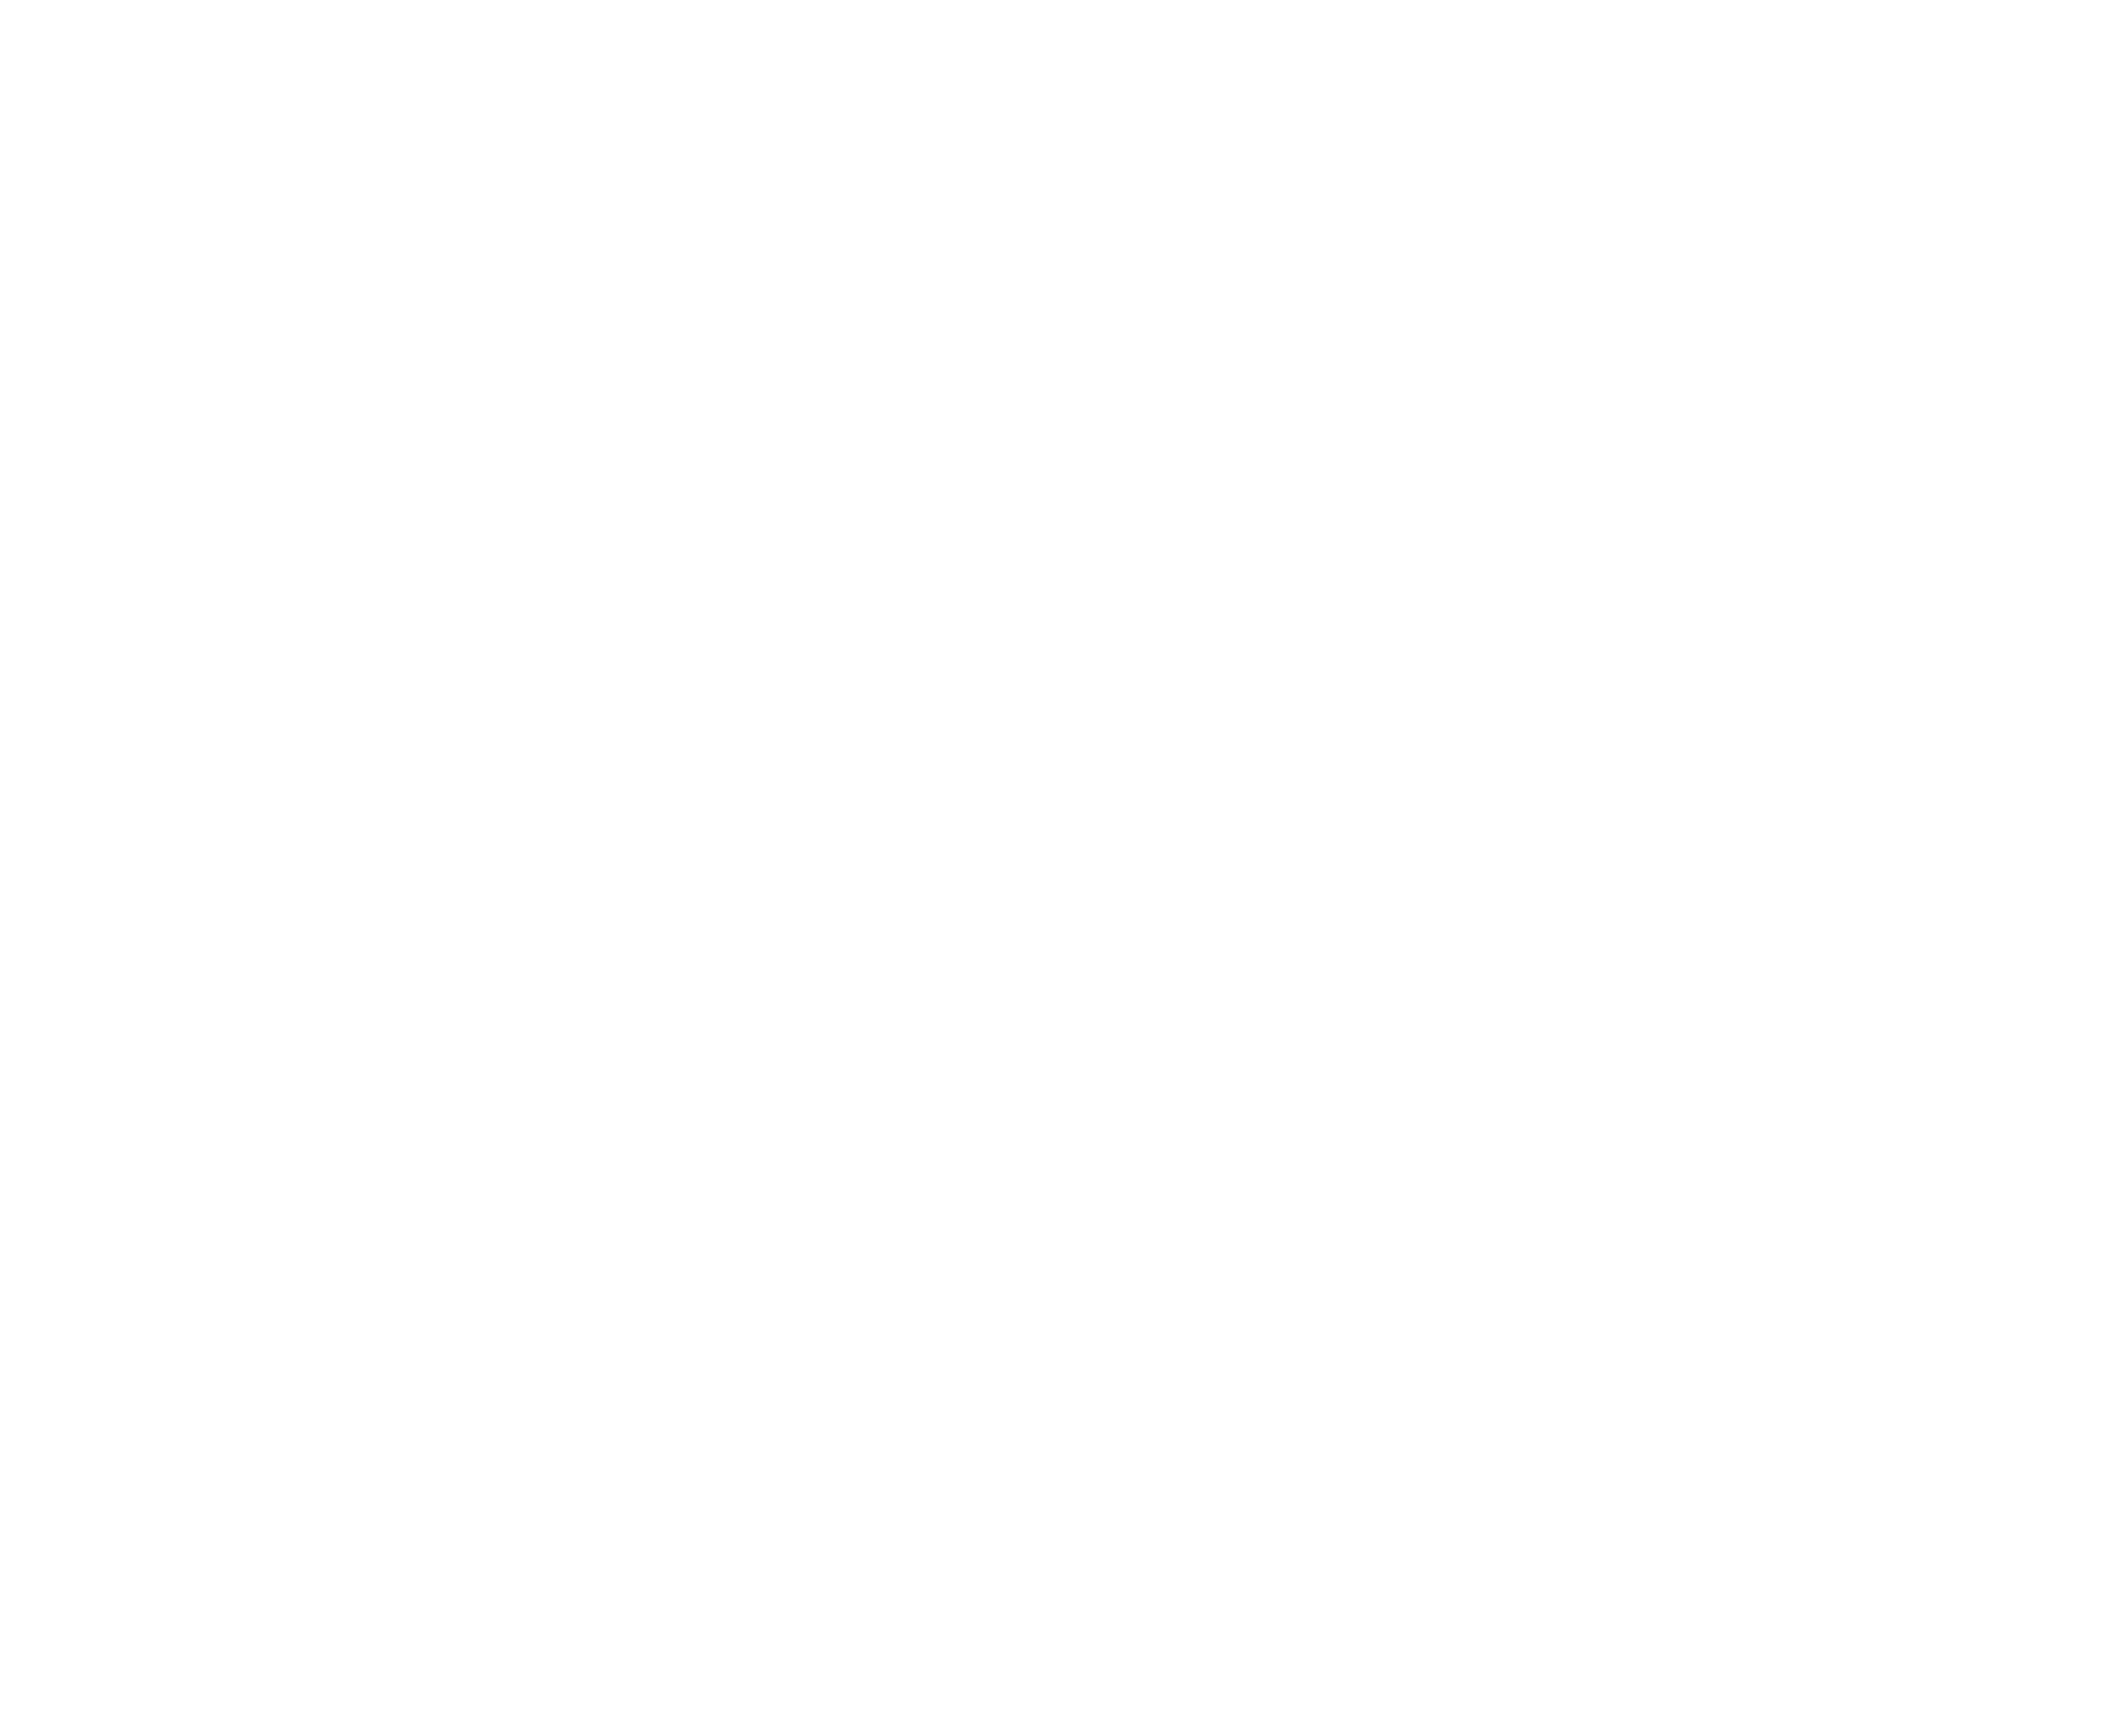 Altraitalia